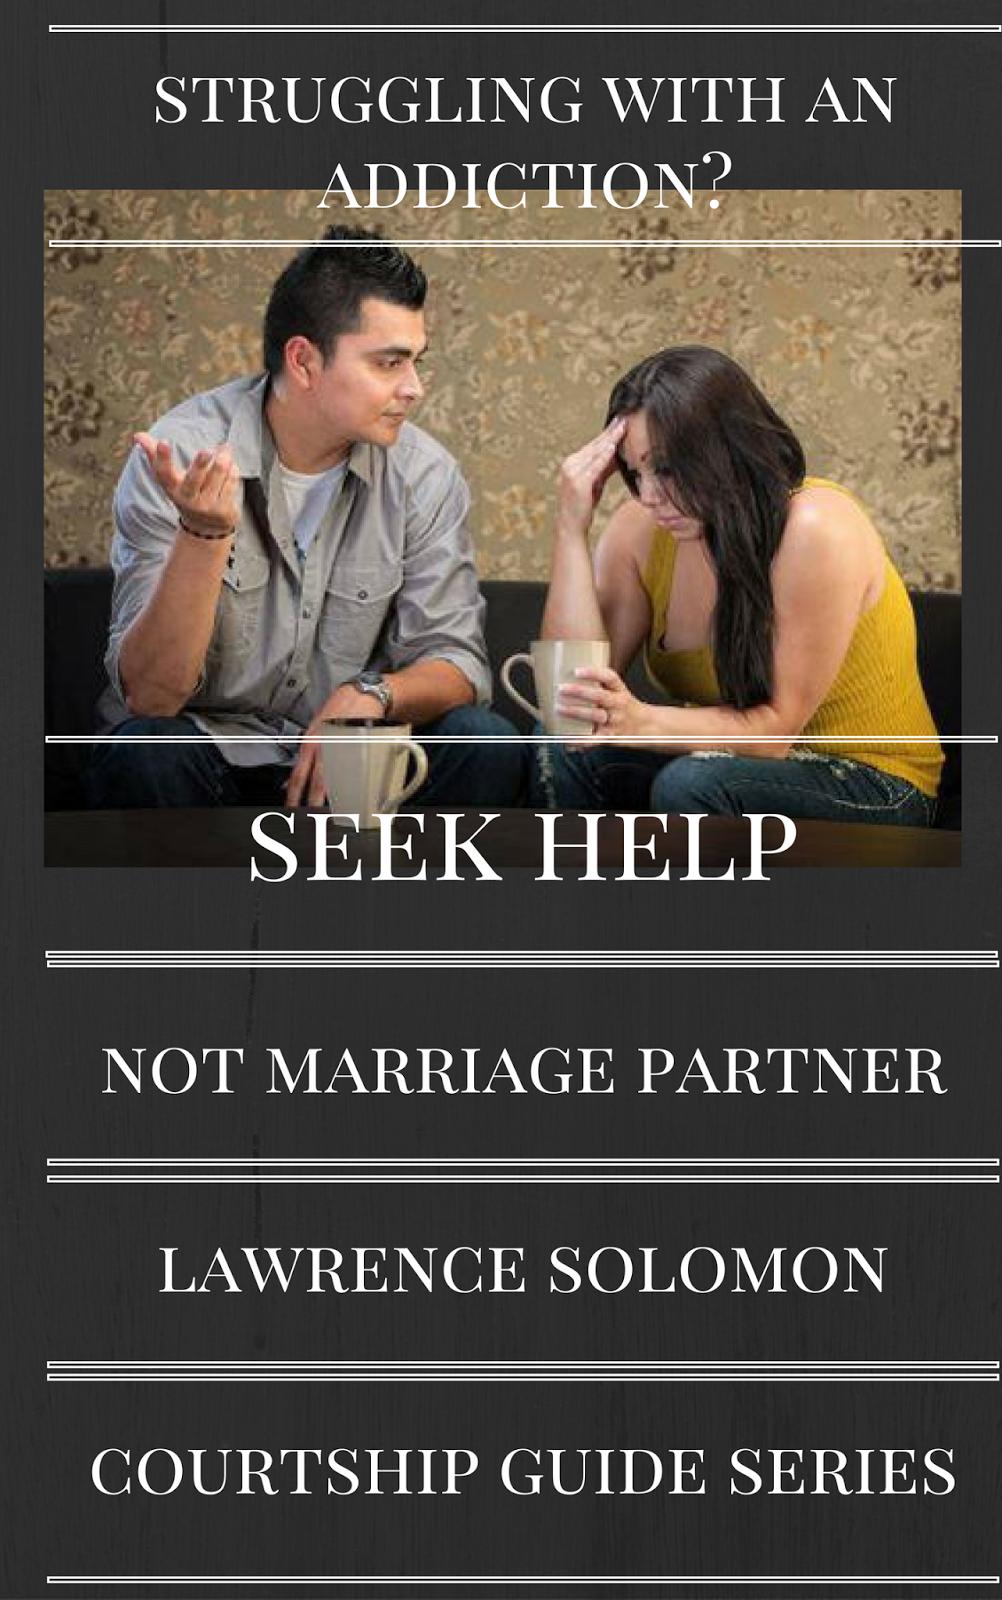 Christian dating struggles